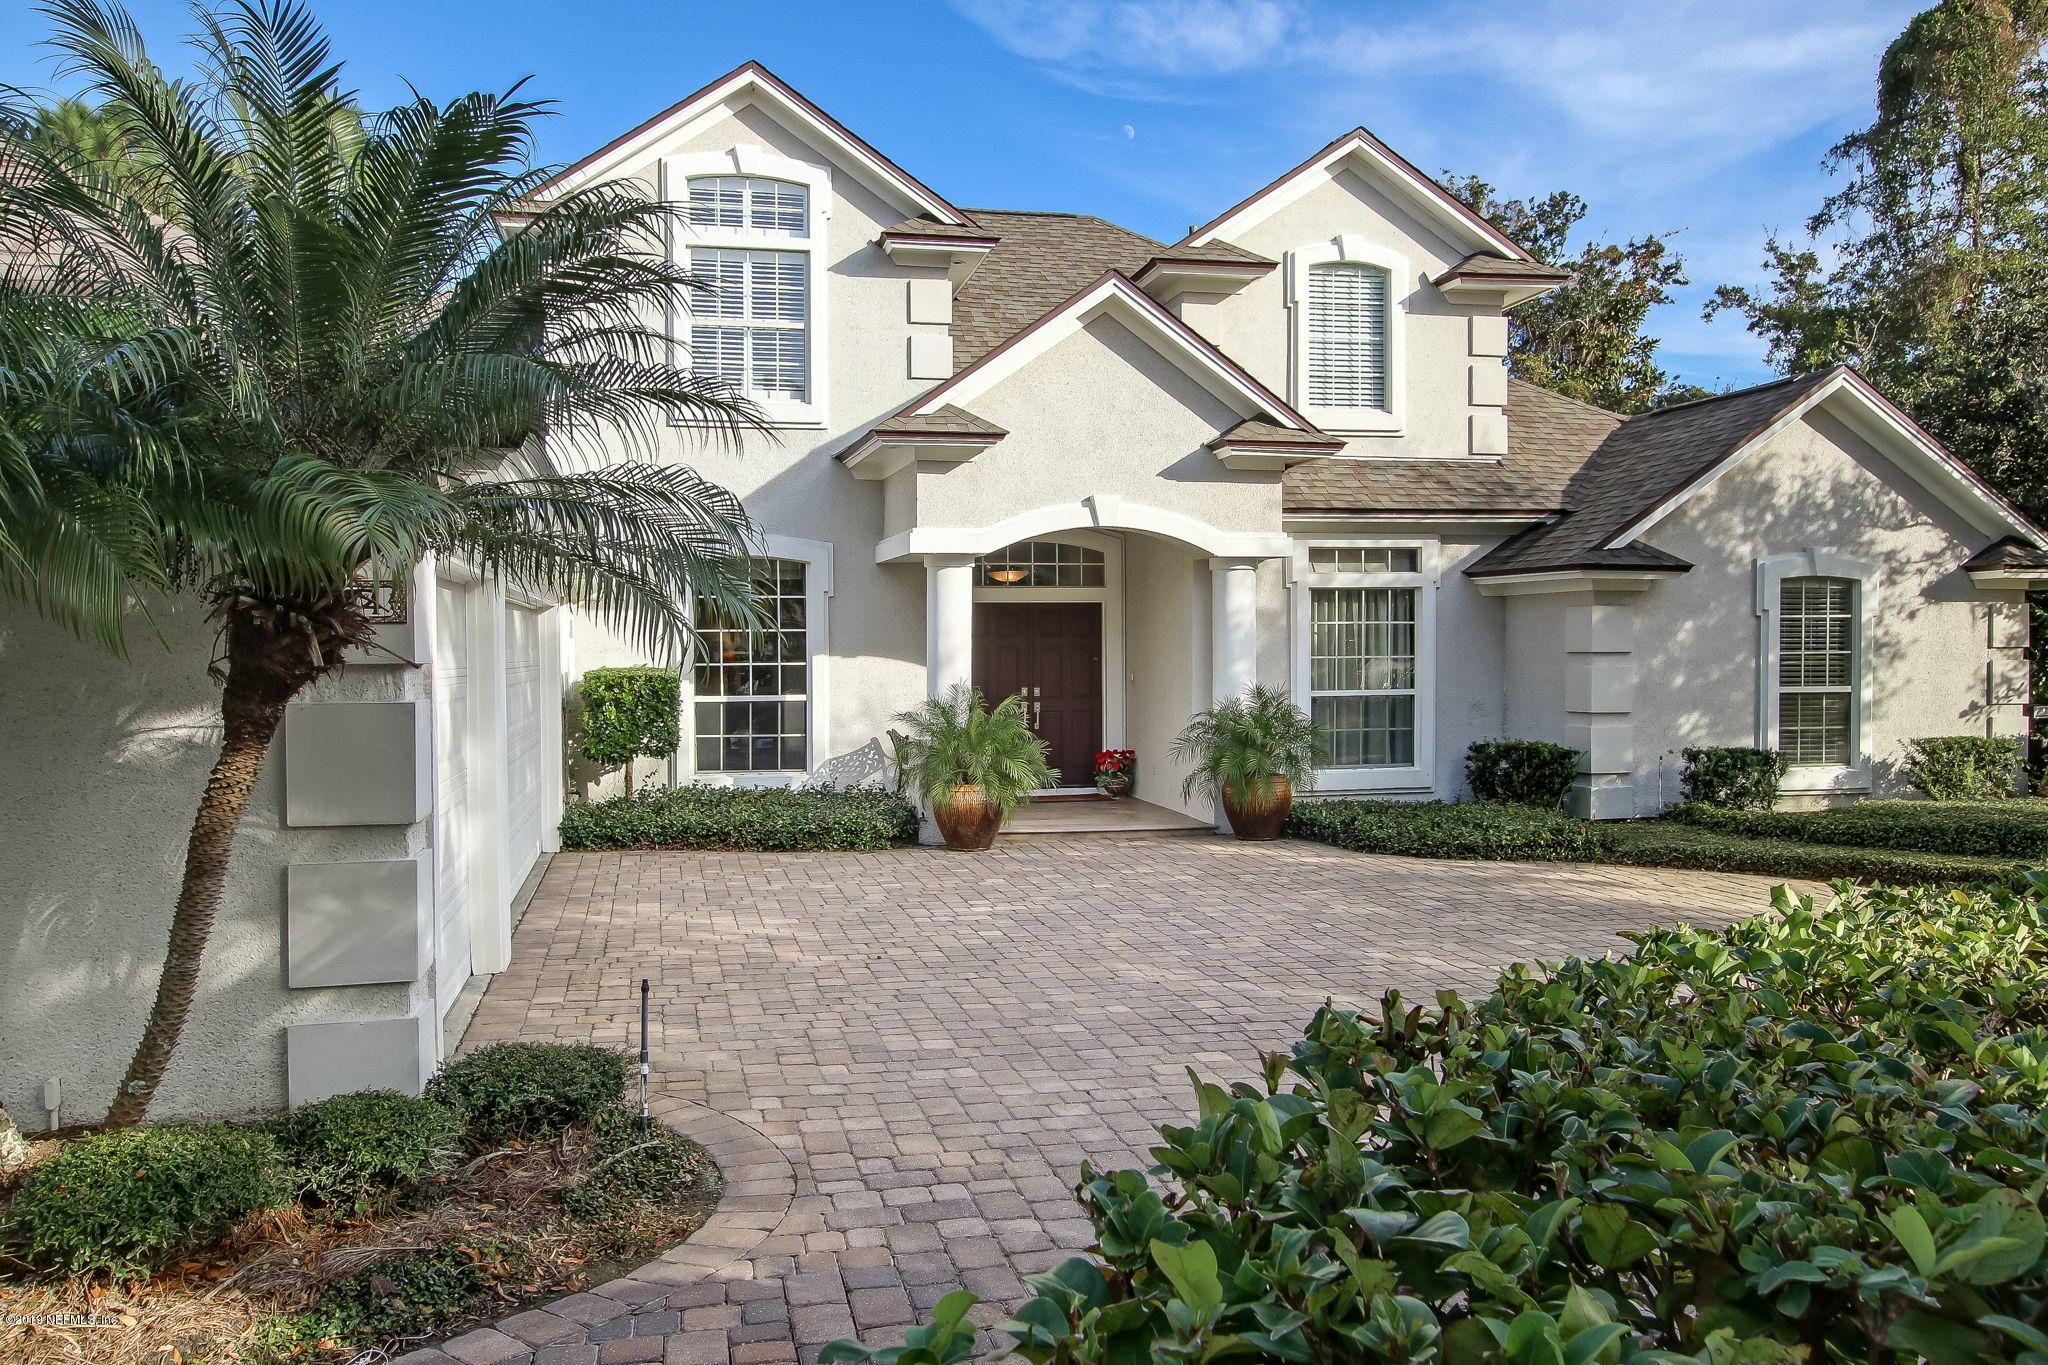 124 DEER HAVEN, PONTE VEDRA BEACH, FLORIDA 32082, 5 Bedrooms Bedrooms, ,4 BathroomsBathrooms,Residential,For sale,DEER HAVEN,1055284